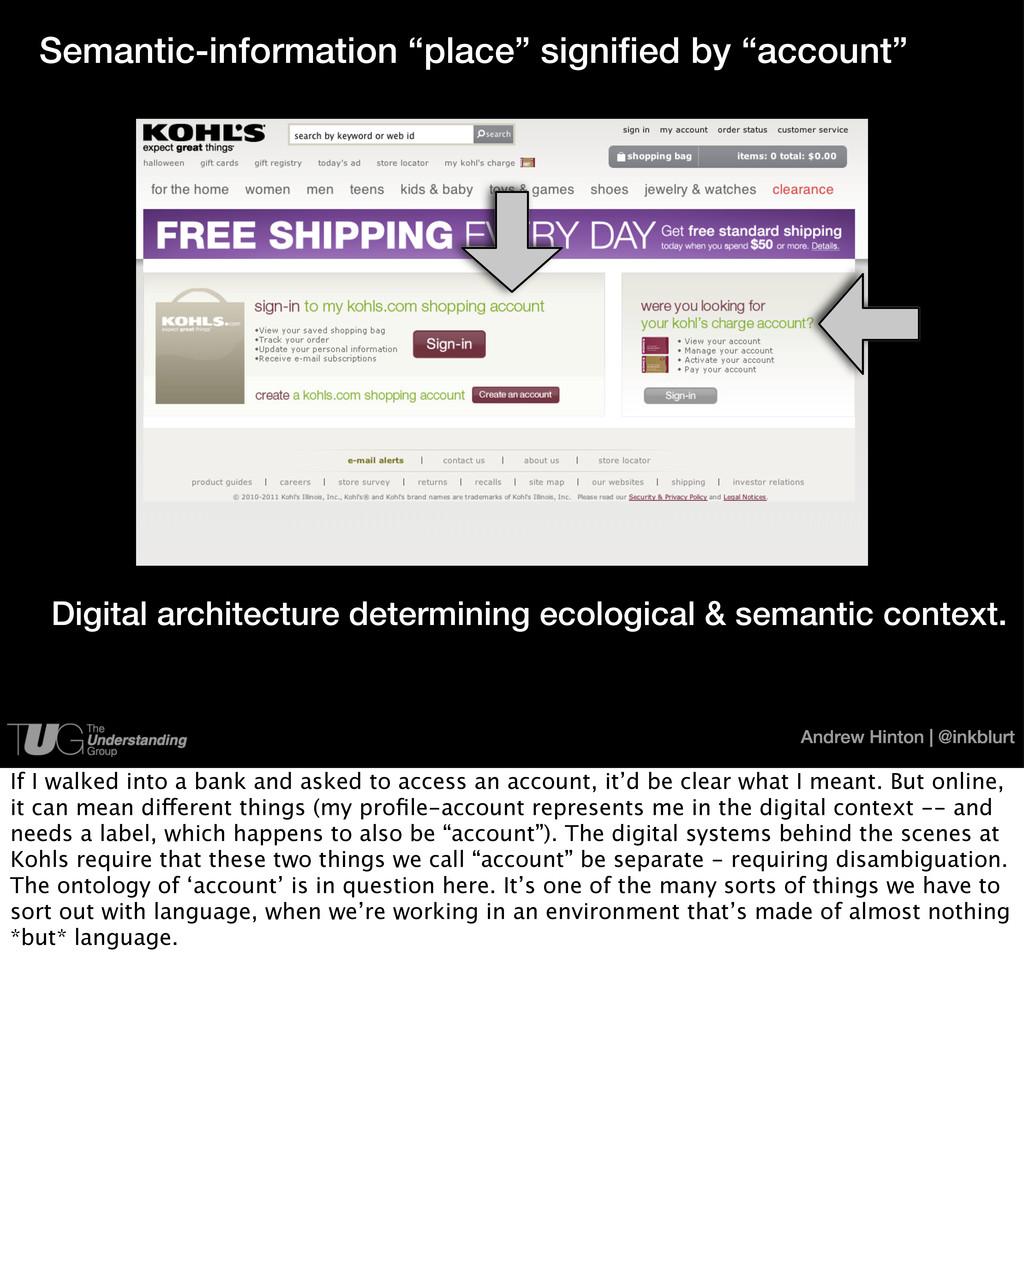 Andrew Hinton | @inkblurt Semantic-information ...